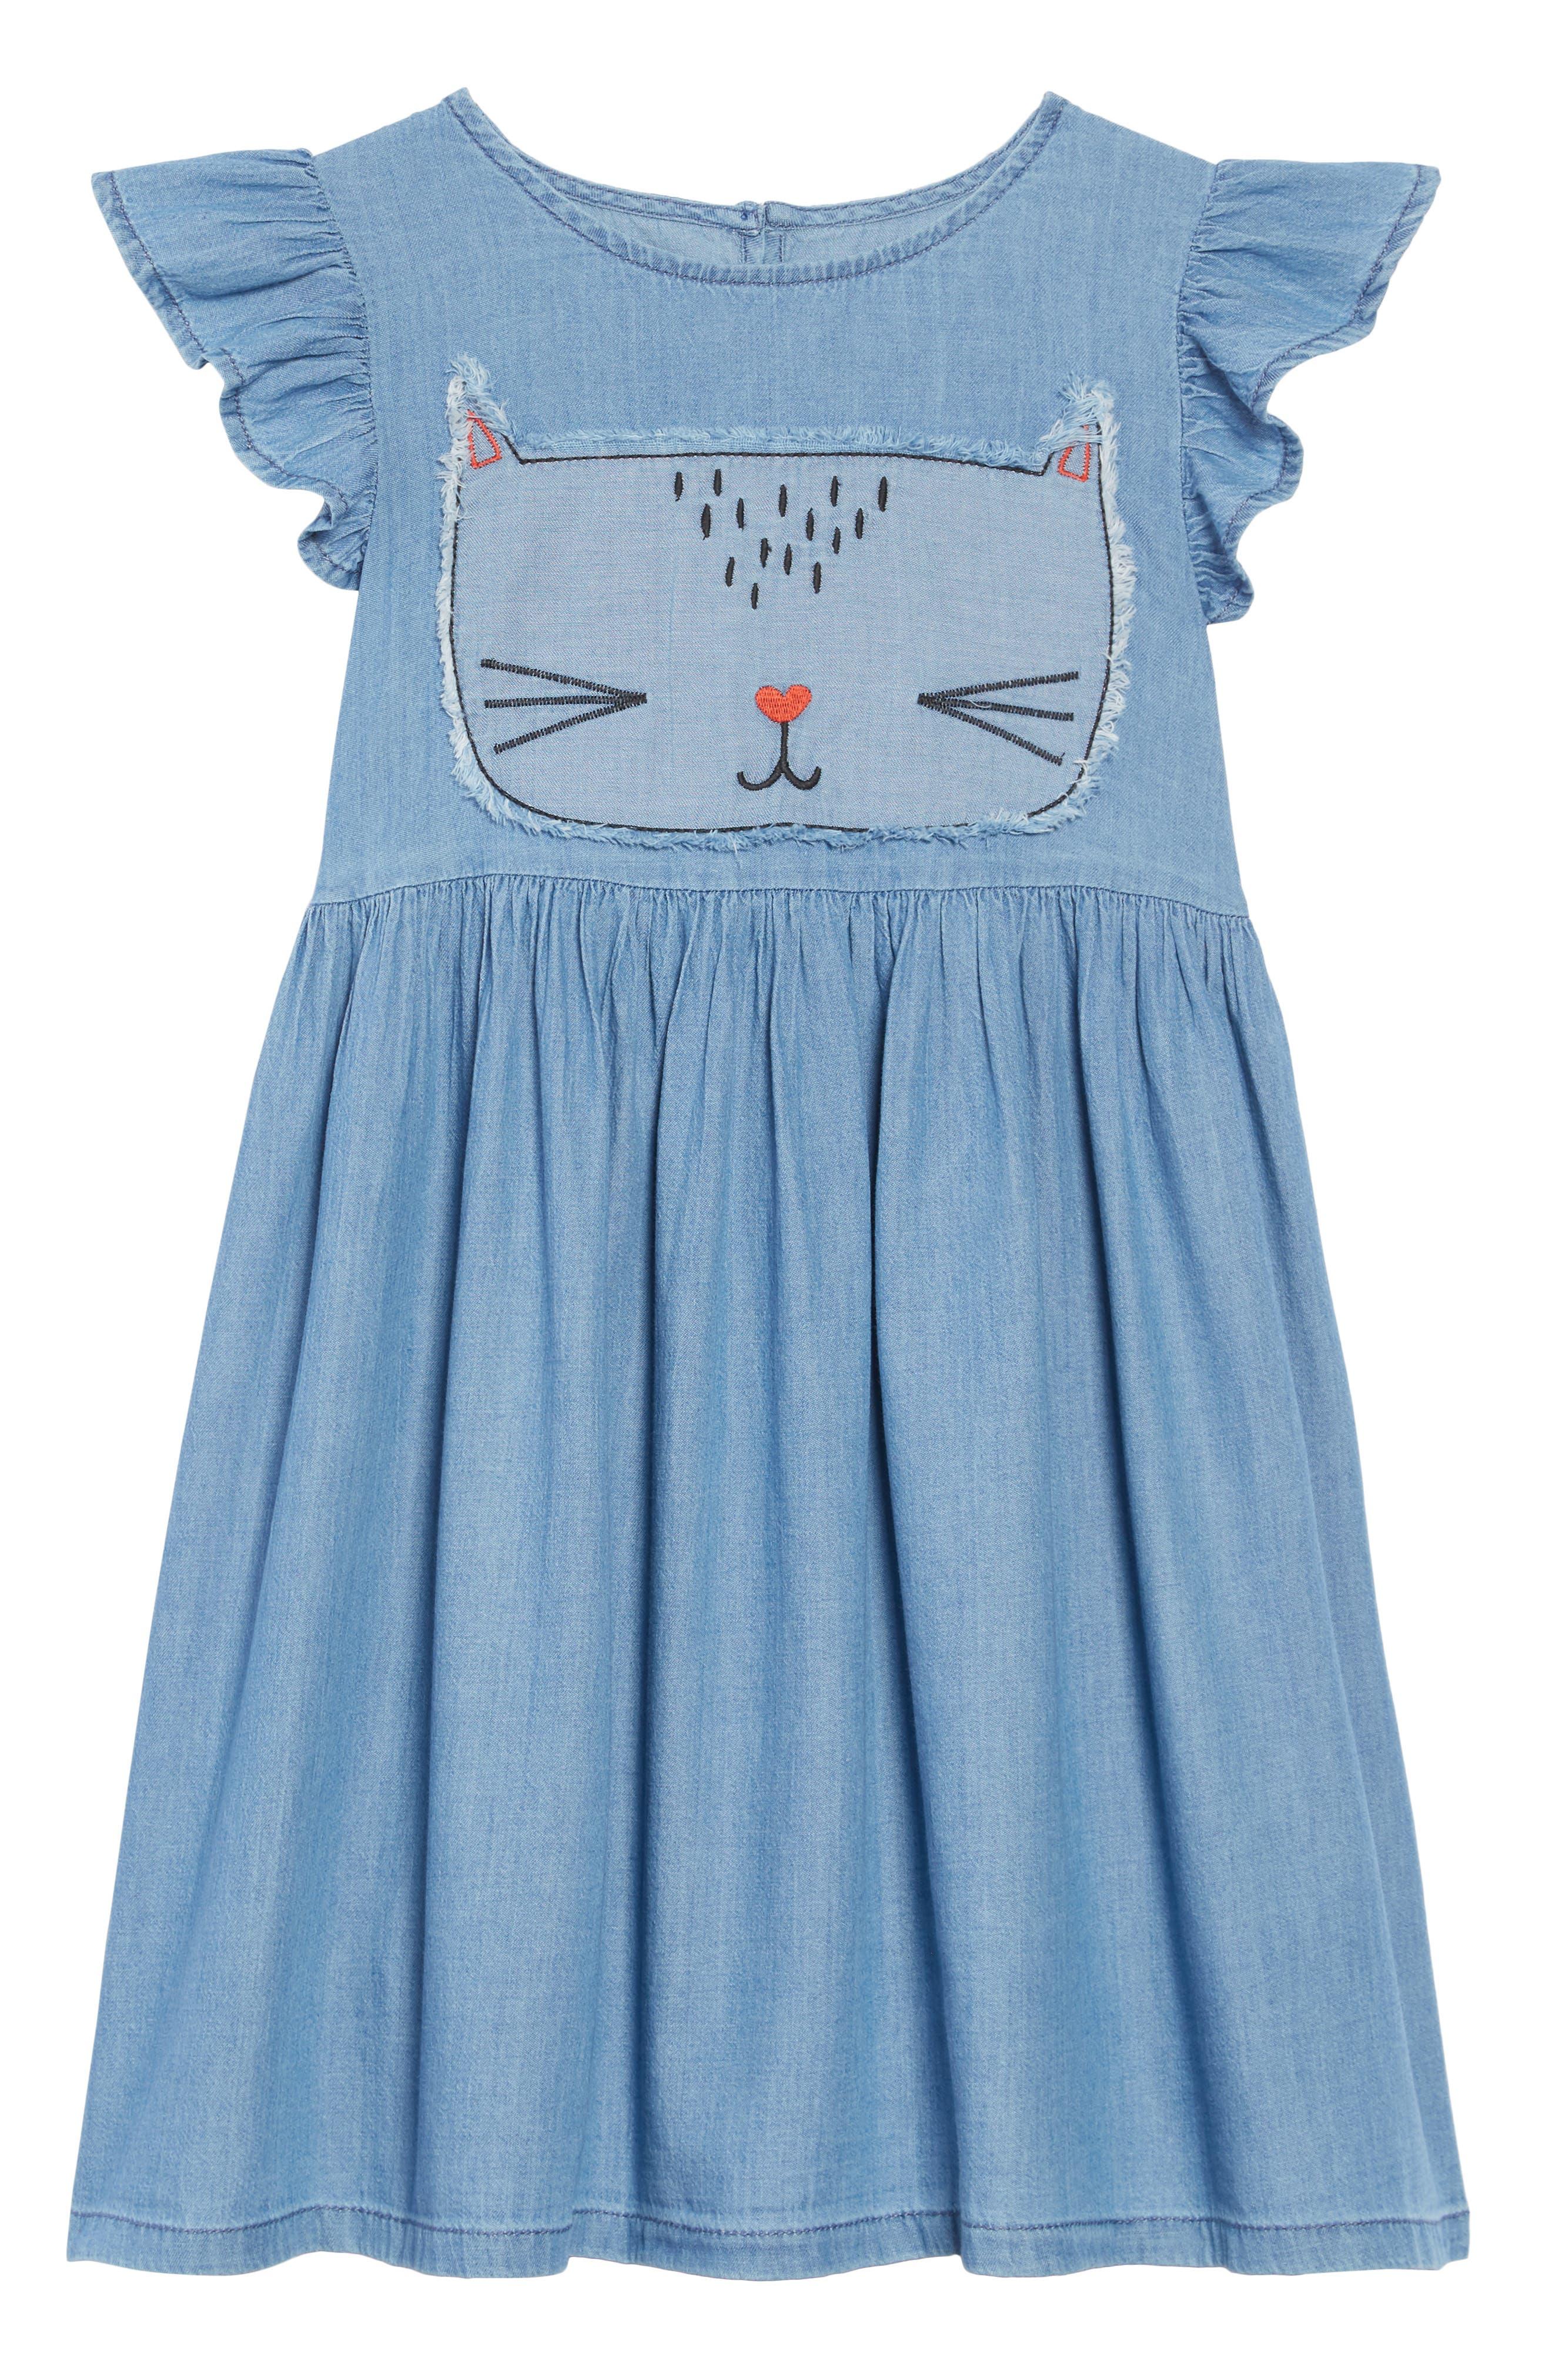 Embroidered Chambray Dress,                             Main thumbnail 1, color,                             450